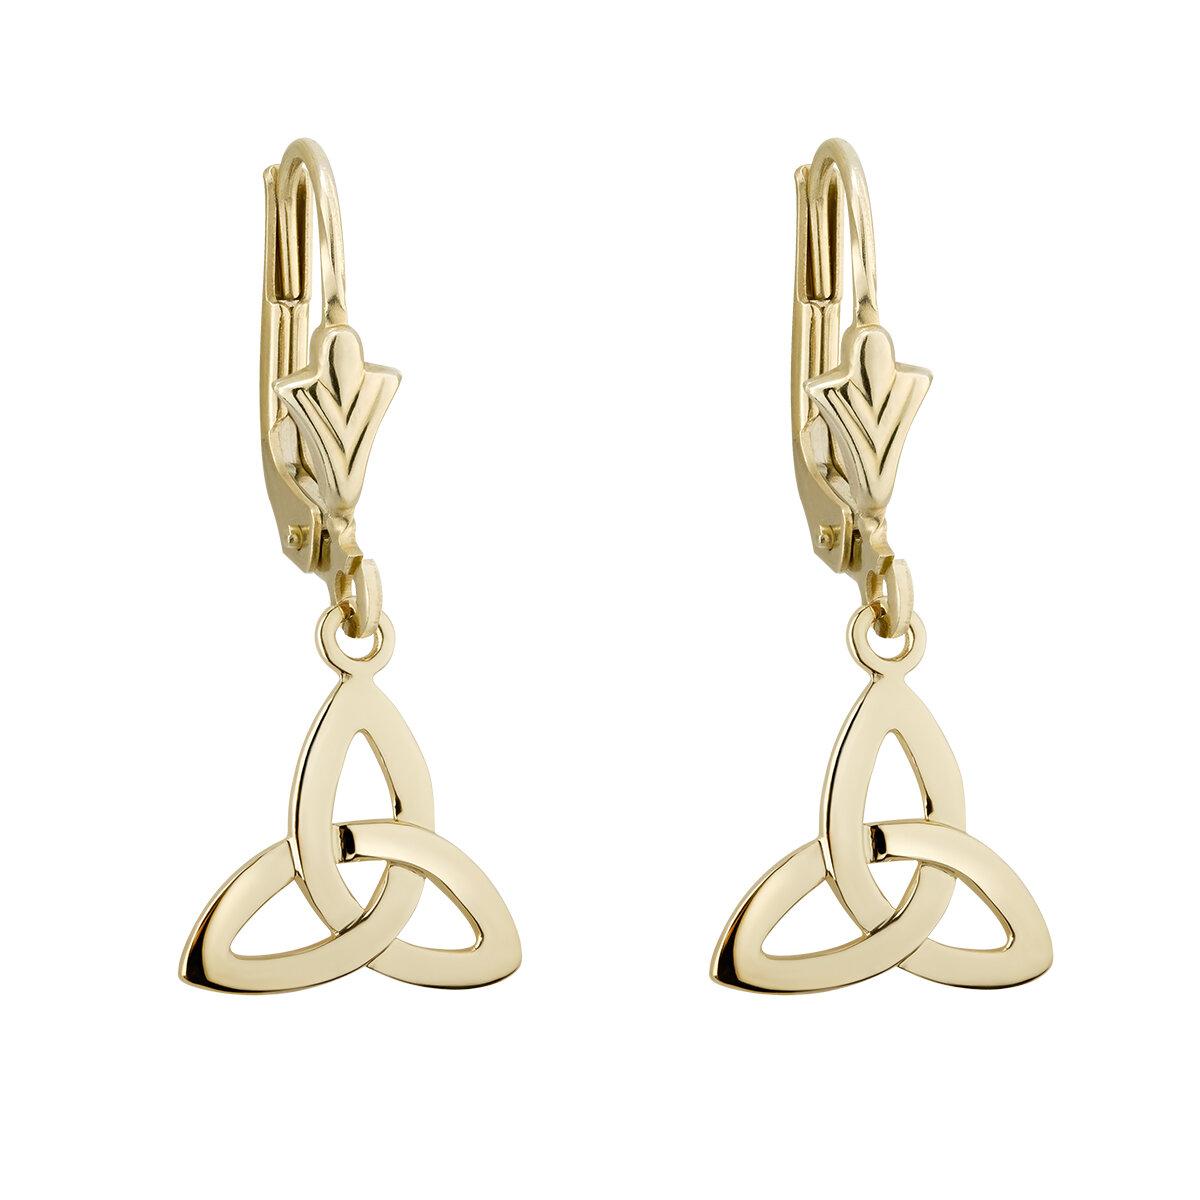 14k gold trinity knot drop earrings s3734 from Solvar